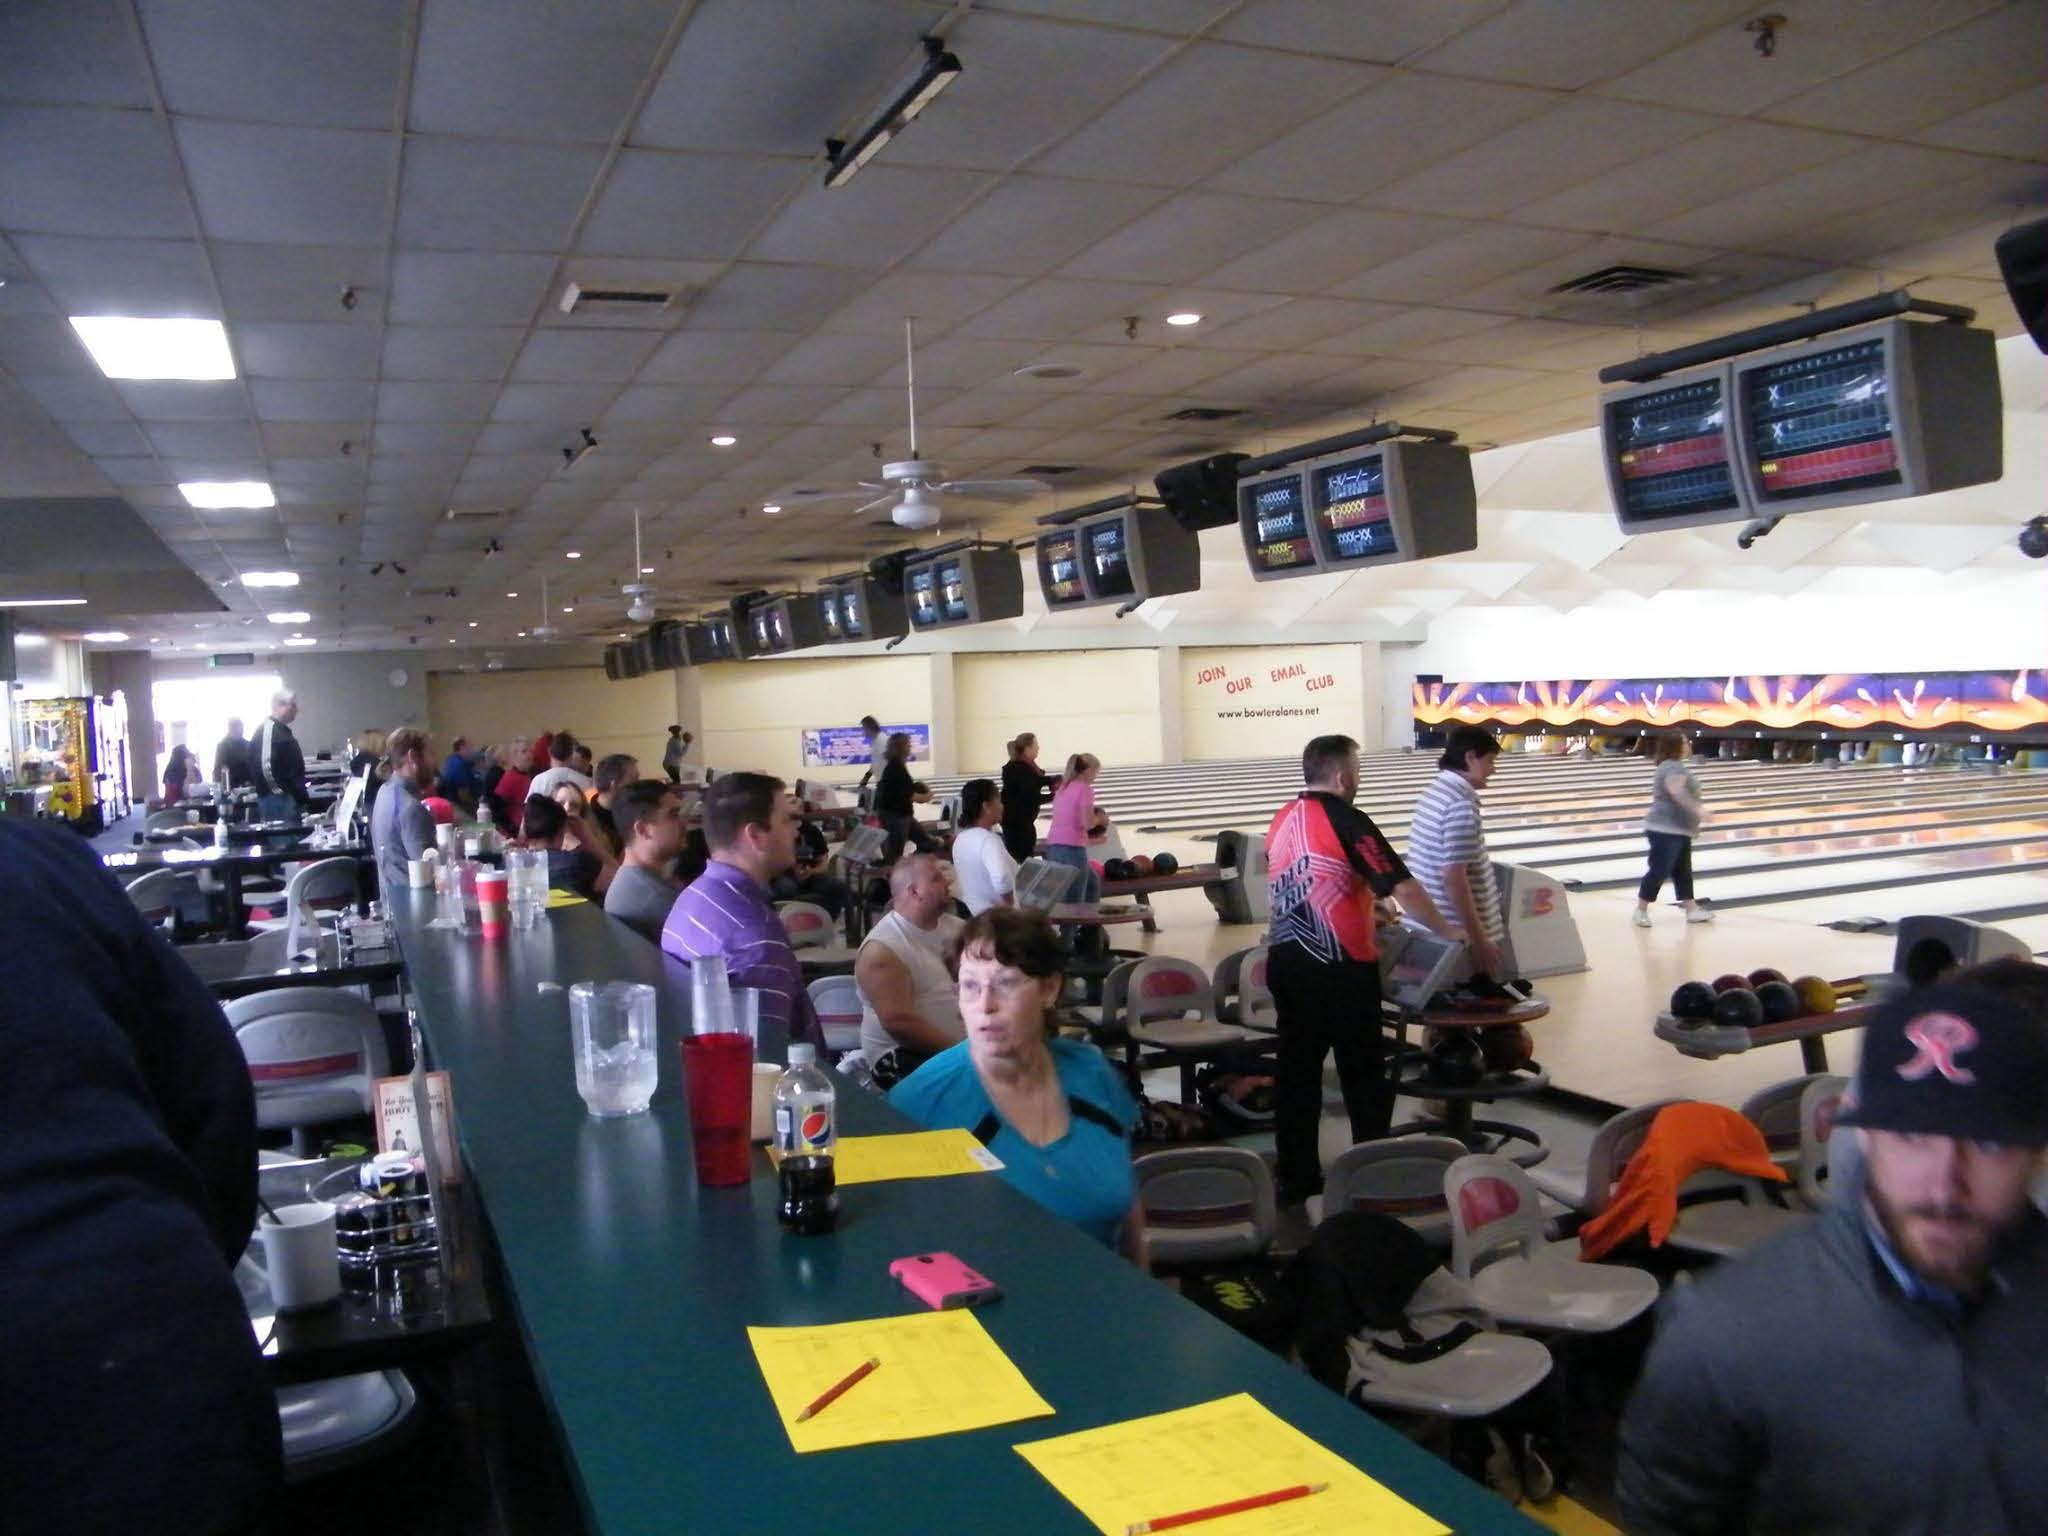 Inside Bowlero Lanes - Lakewood, Washington - Lakewood bowling alley - bowl with friends - enjoy great food